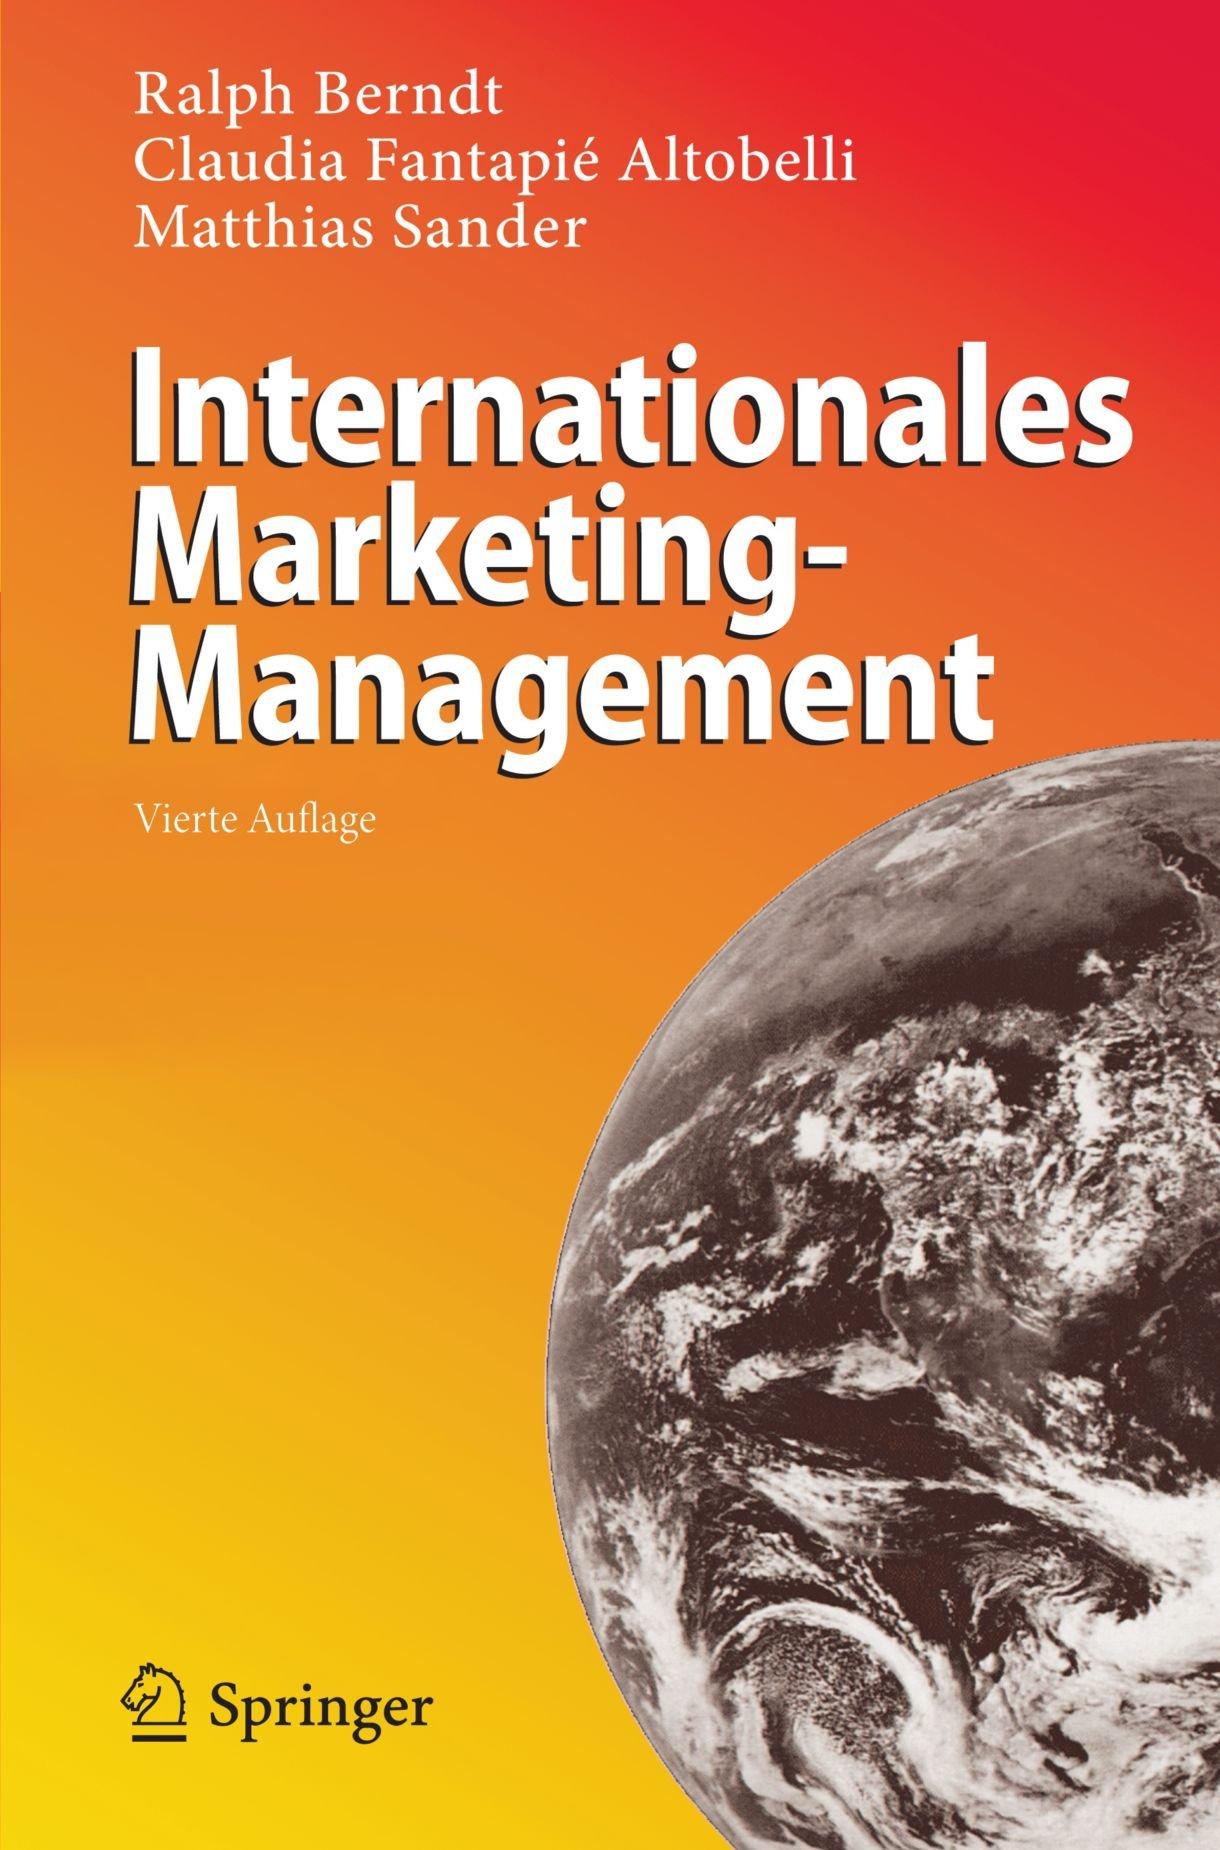 Internationales Marketing-Management (German Edition)